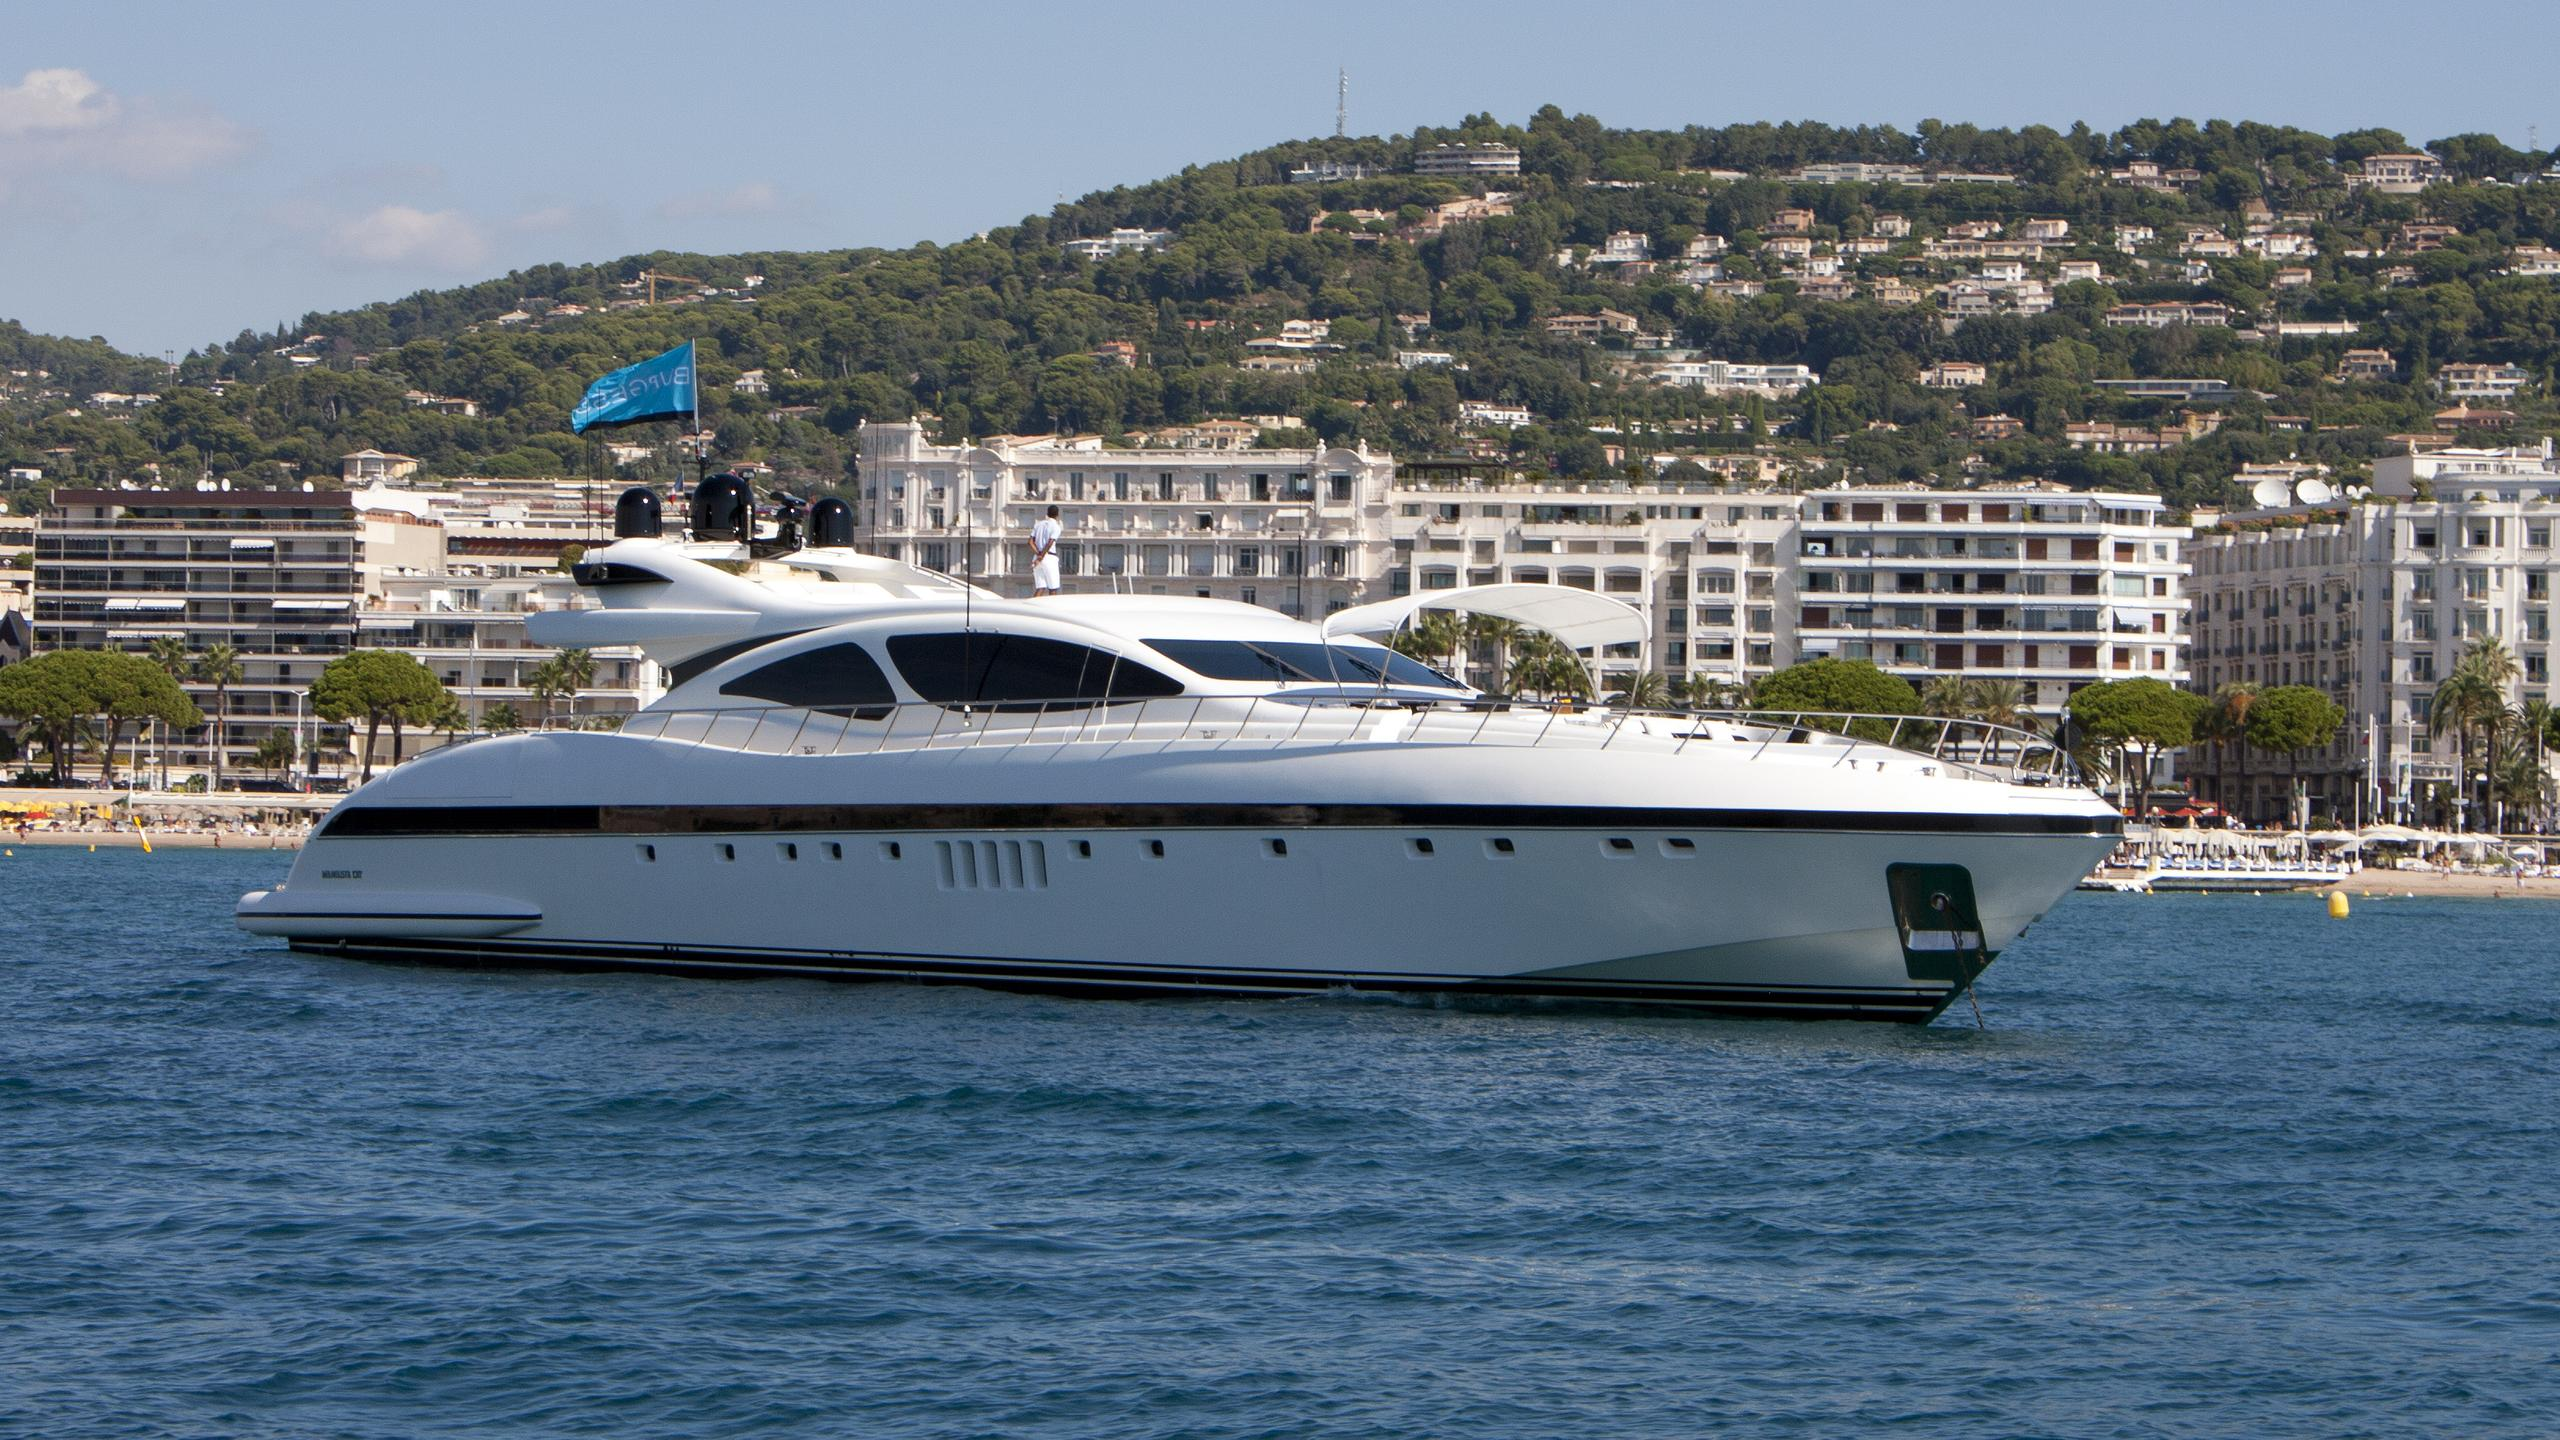 shane ability salvaje motoryacht overmarine 33m 2004 half profile